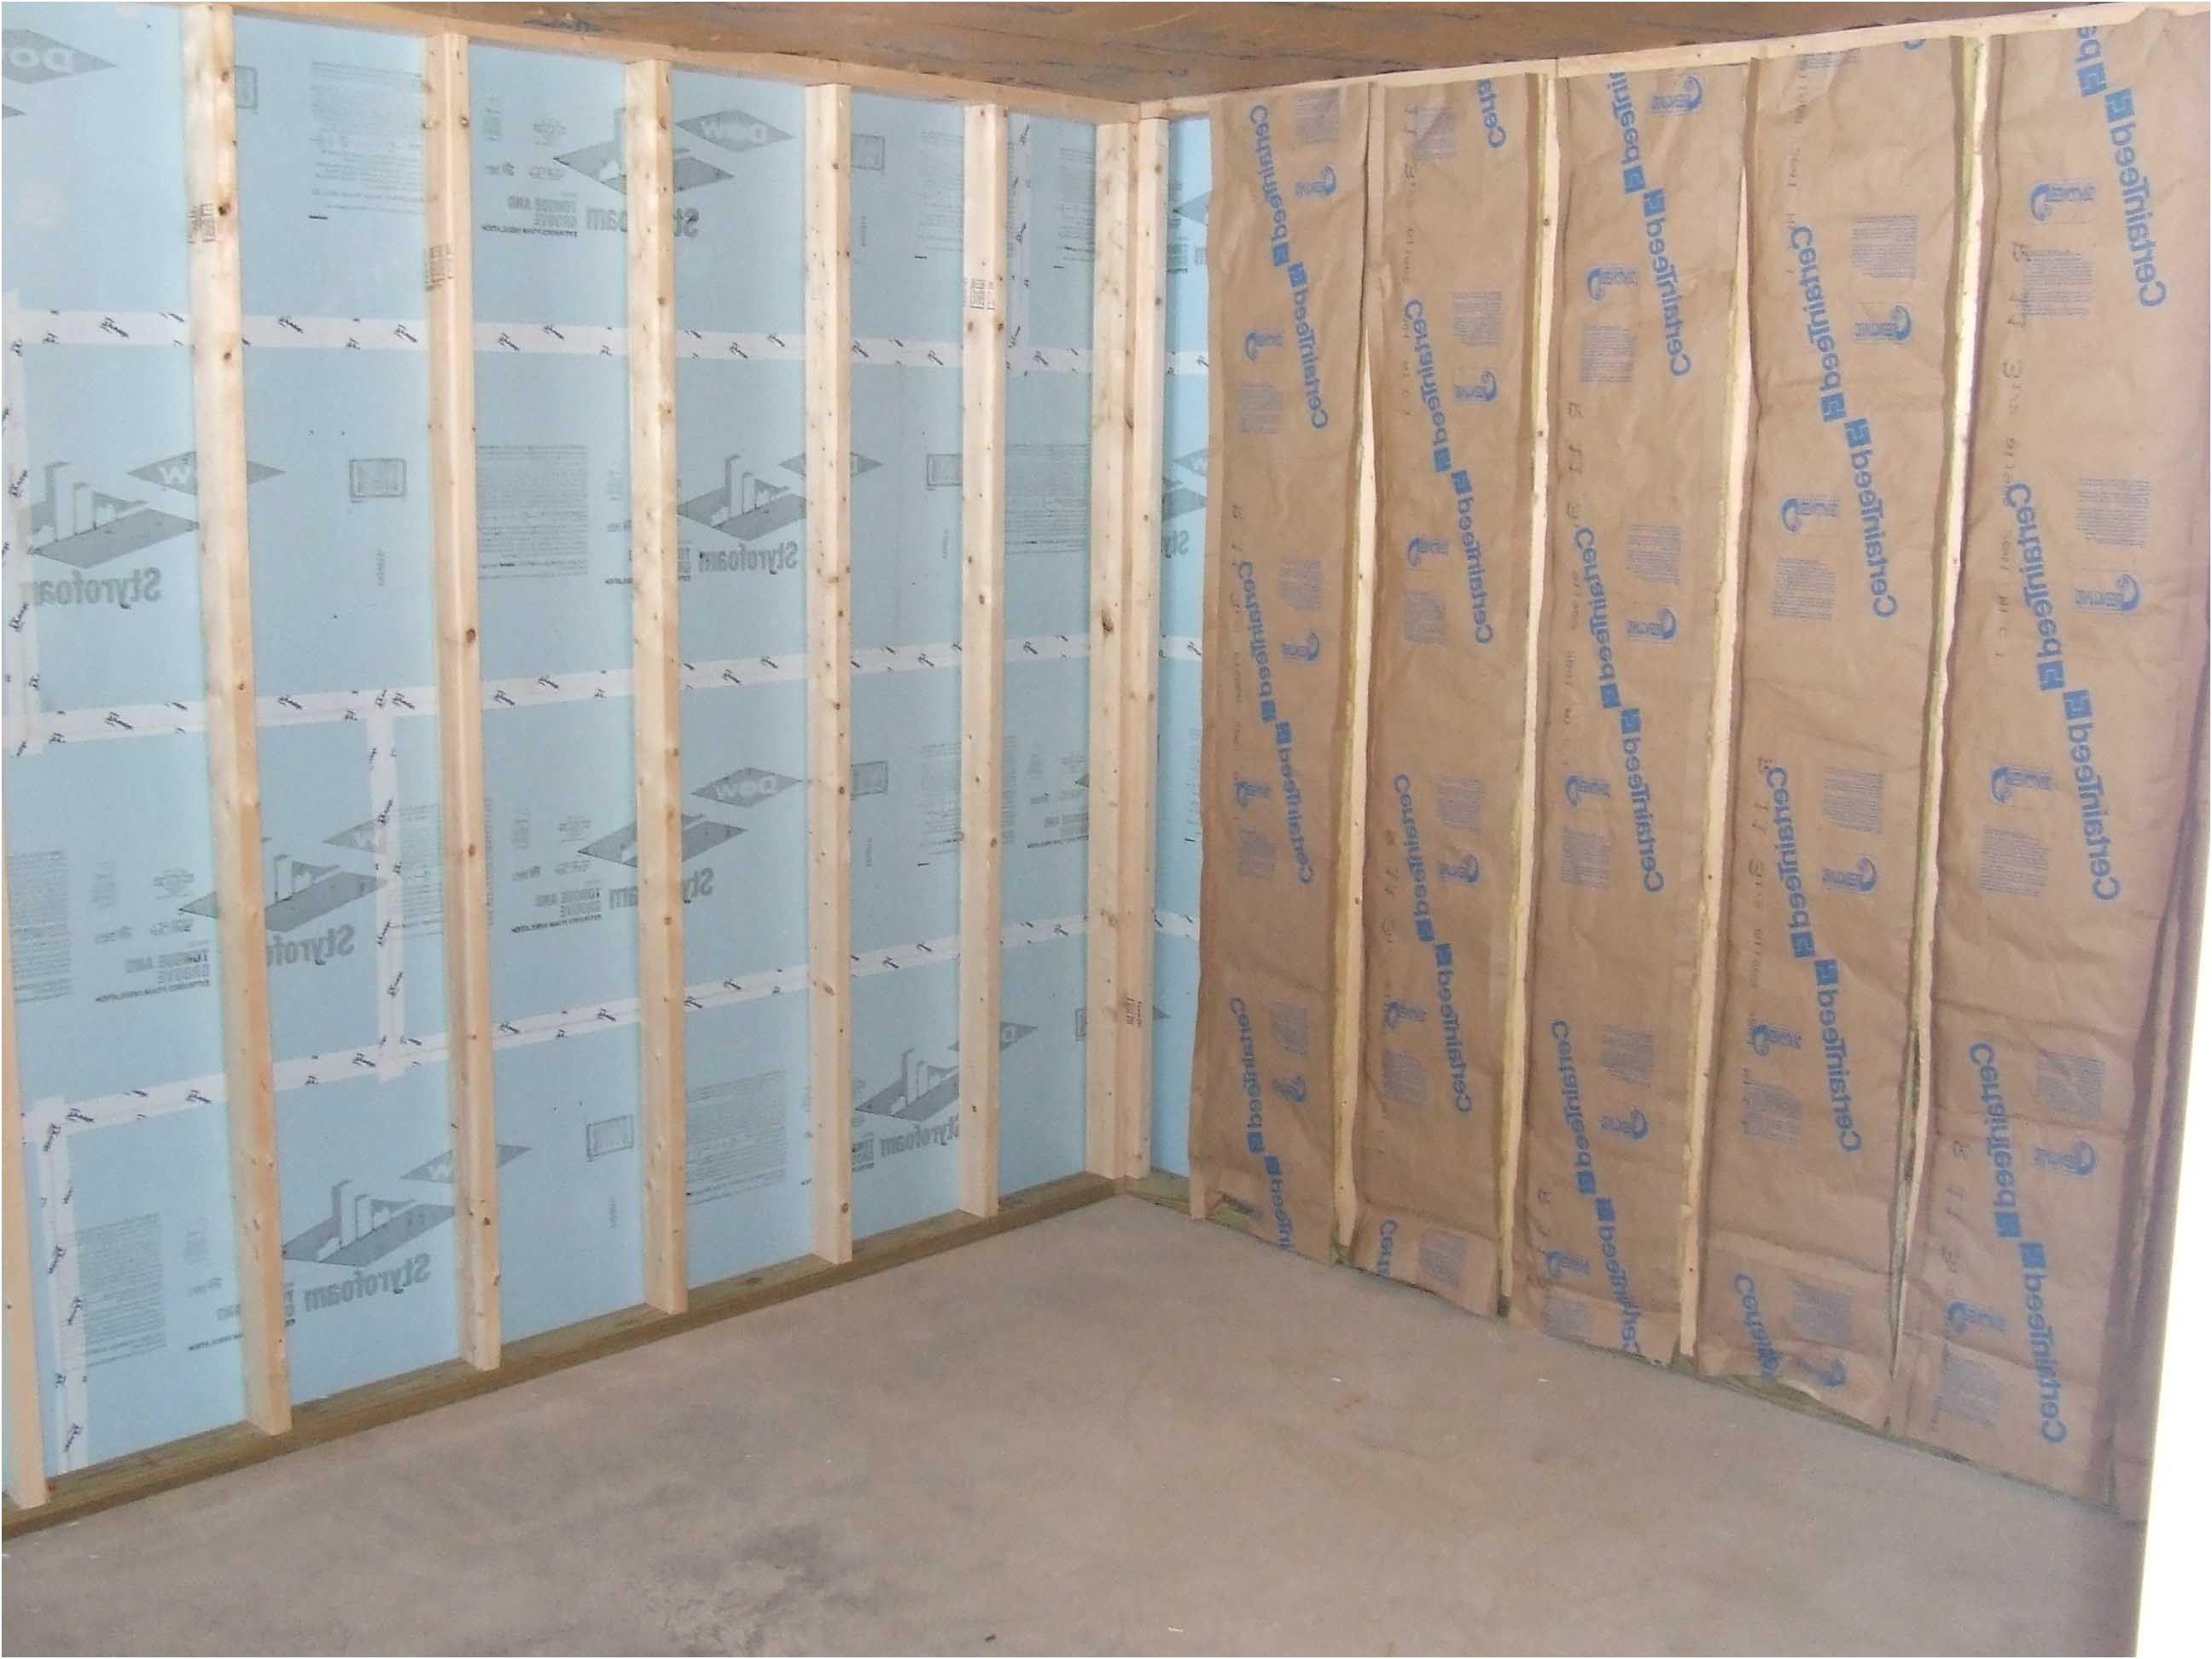 best methods for insulating basement walls from Furring Basement Walls & best methods for insulating basement walls from Furring Basement ...